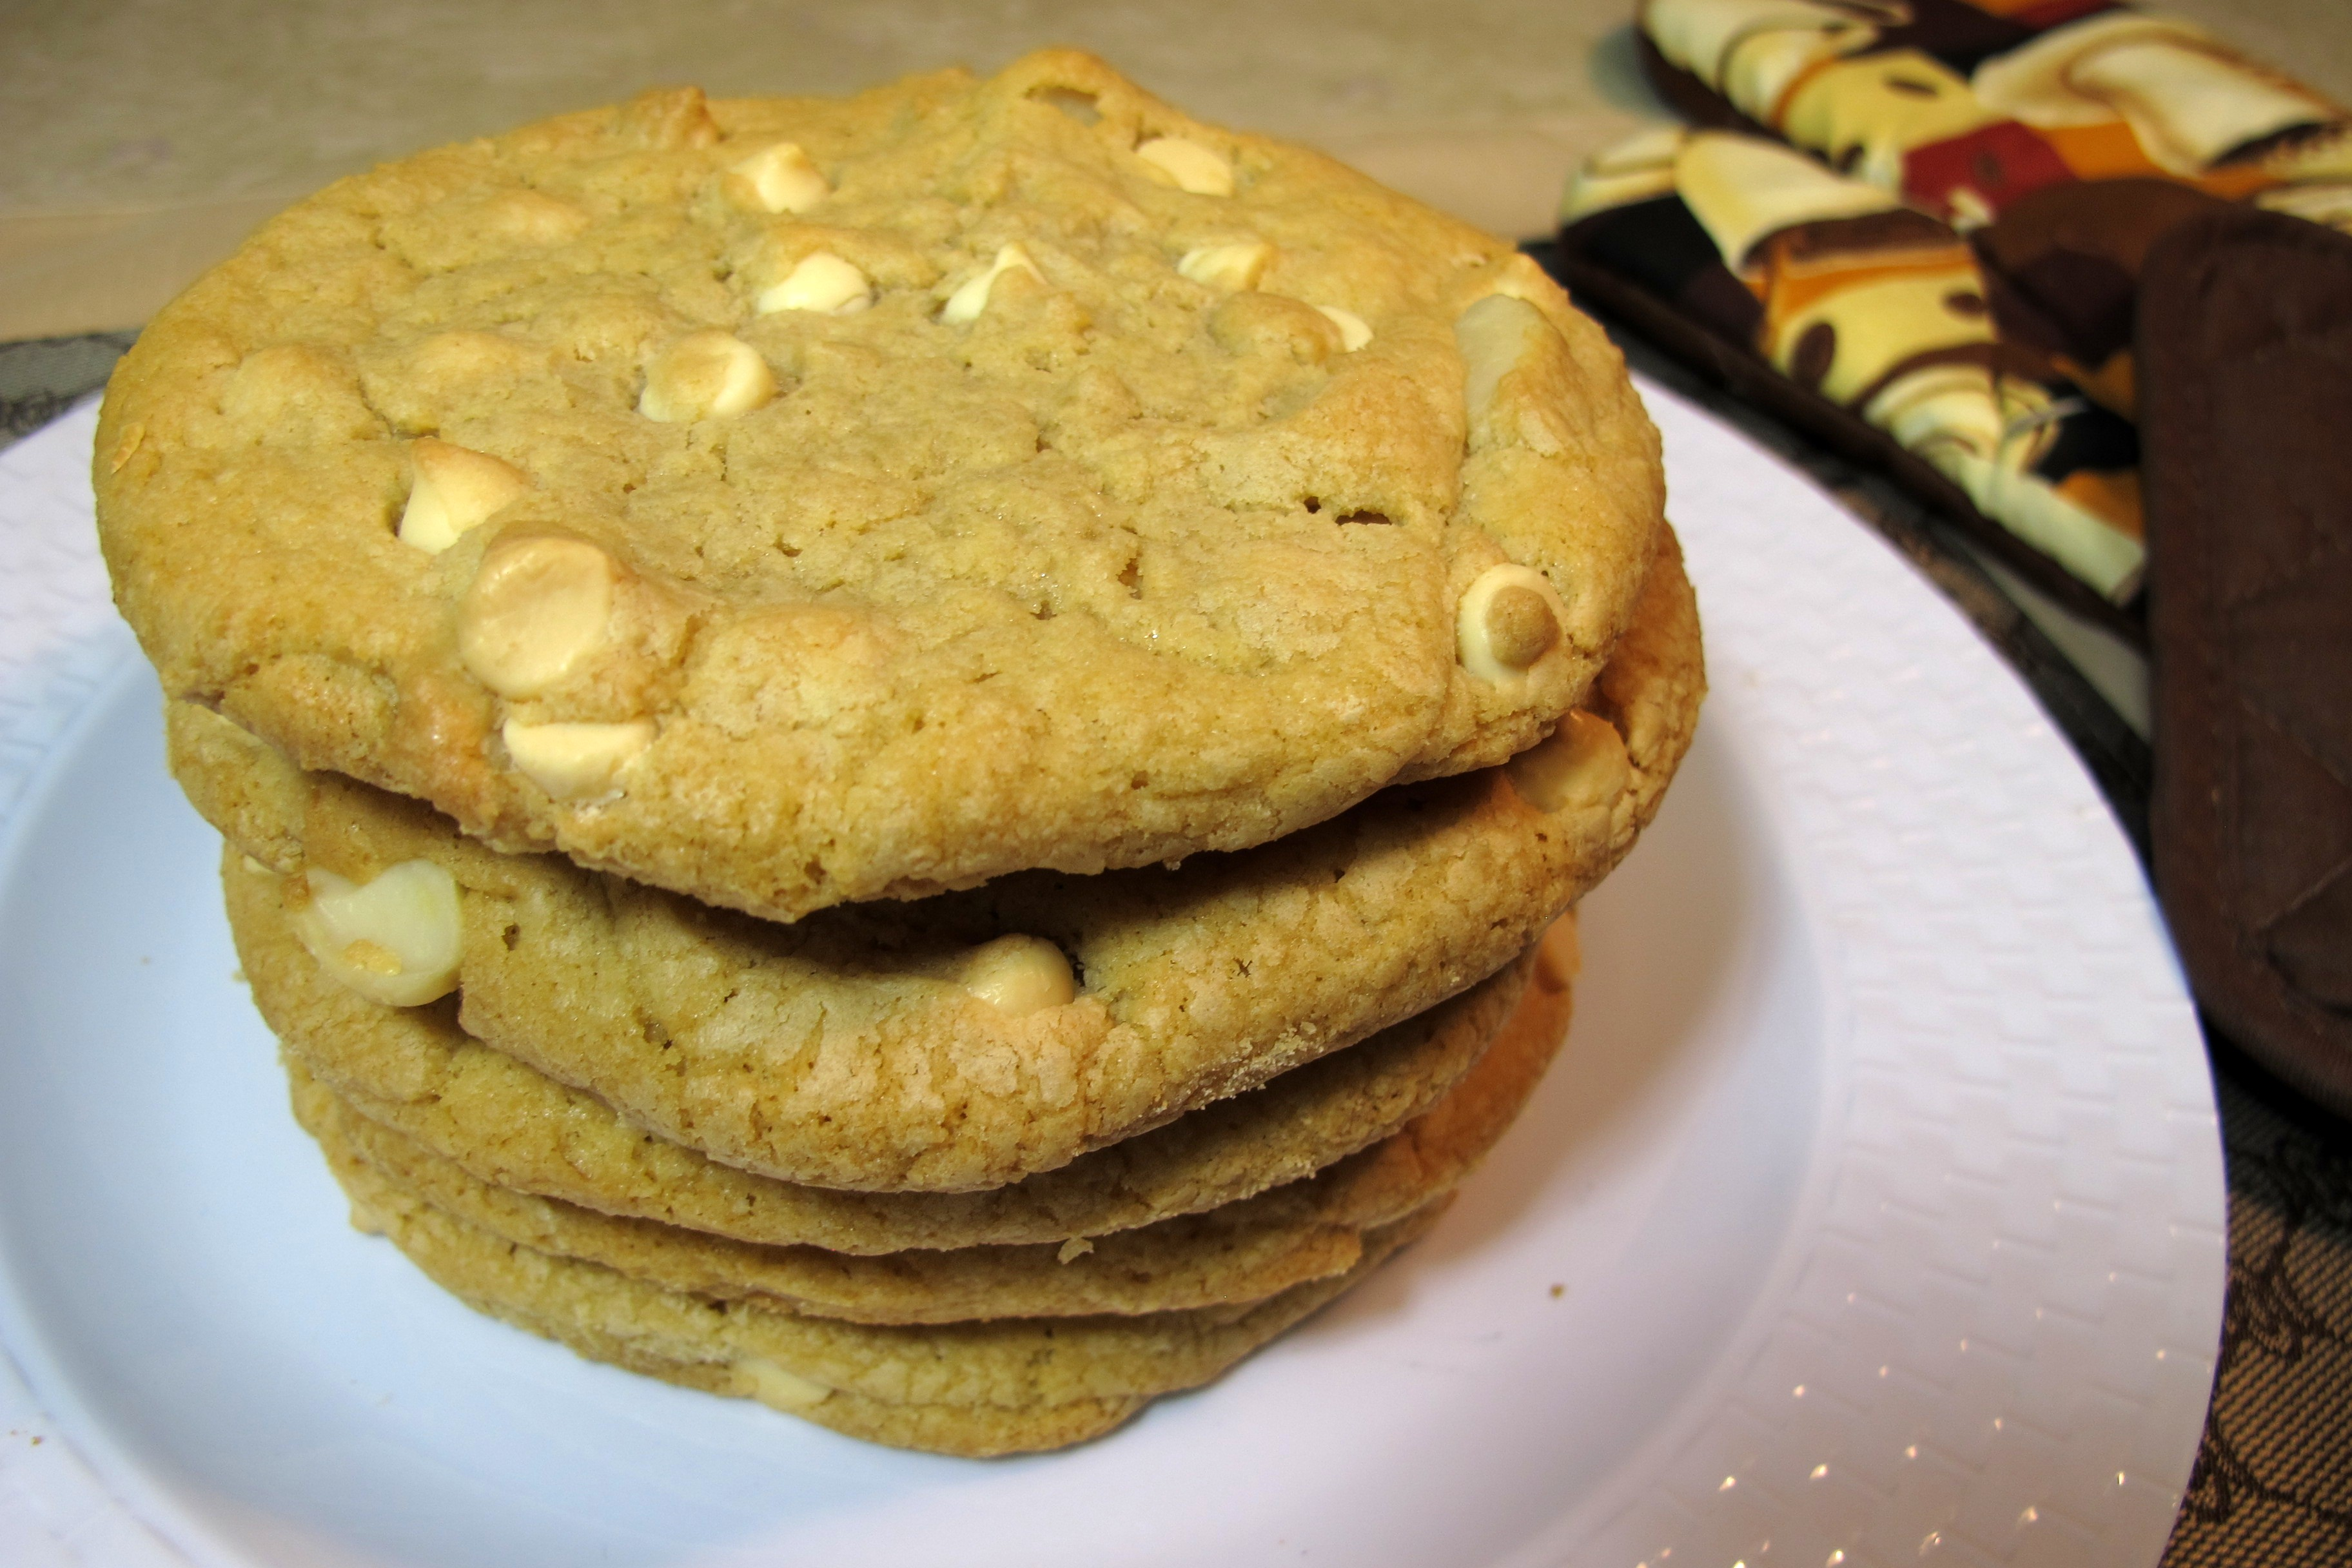 White Chocolate Macadamia Nut Gourmet Cookie | Seattle's Favorite